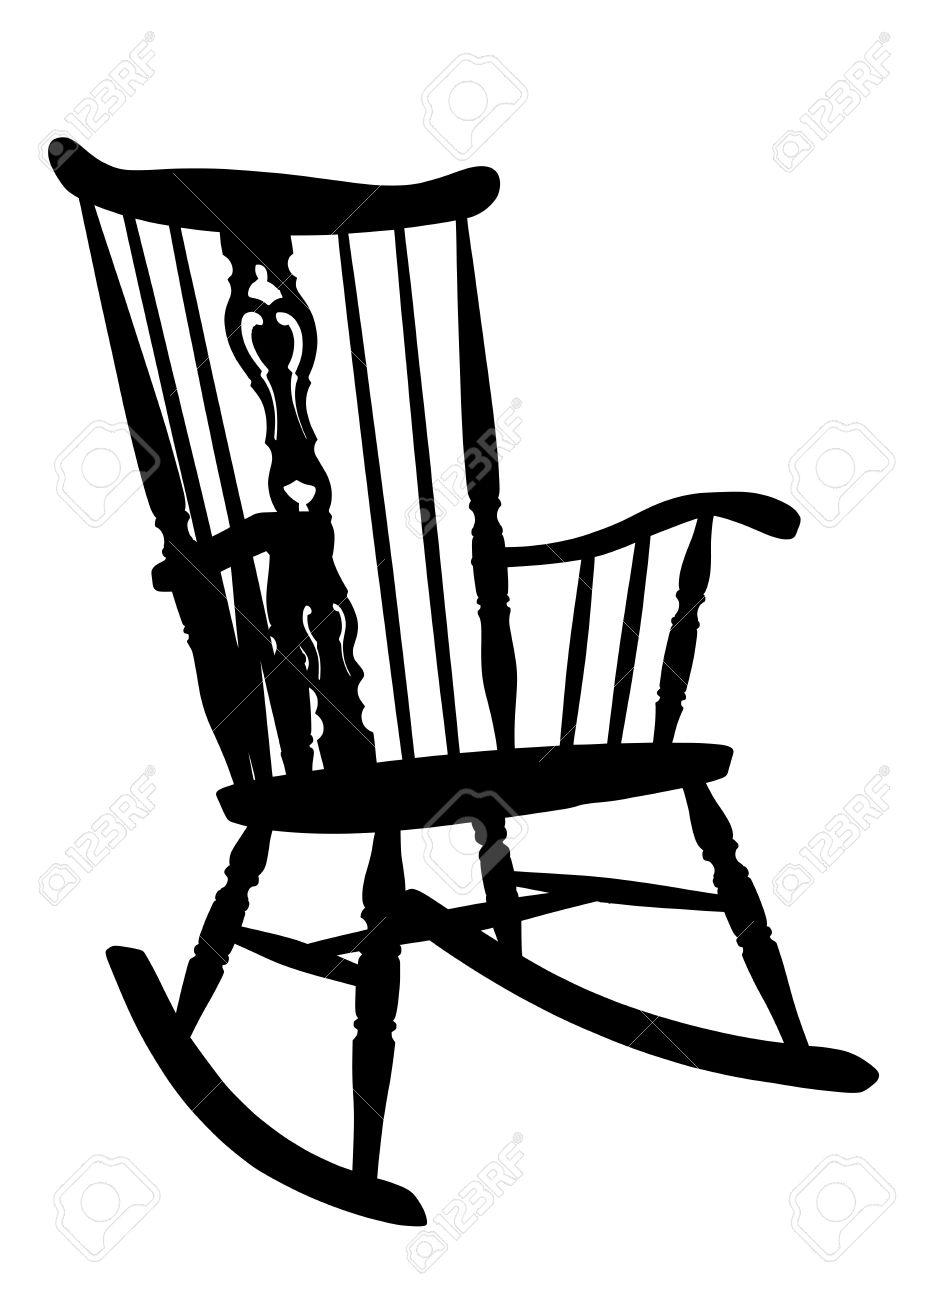 Vintage rocking chair clipart clip art black and white Cartoon Rocking Chair Clipart | Free download best Cartoon Rocking ... clip art black and white